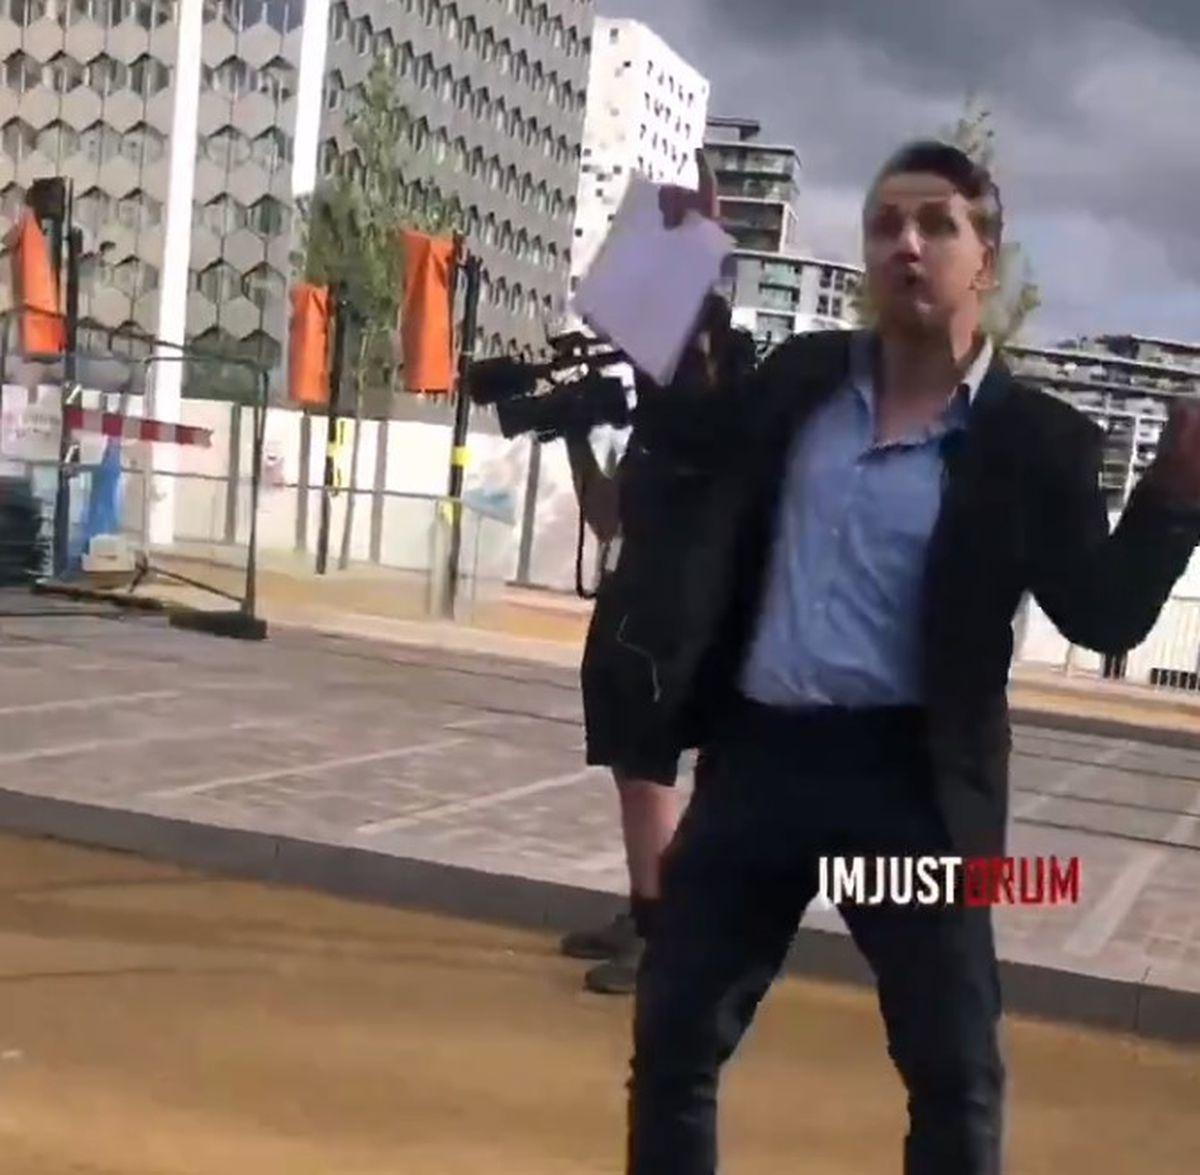 Footage was captured of ITV Central reporter Callum Watkinson. Photo: ImJustBrum